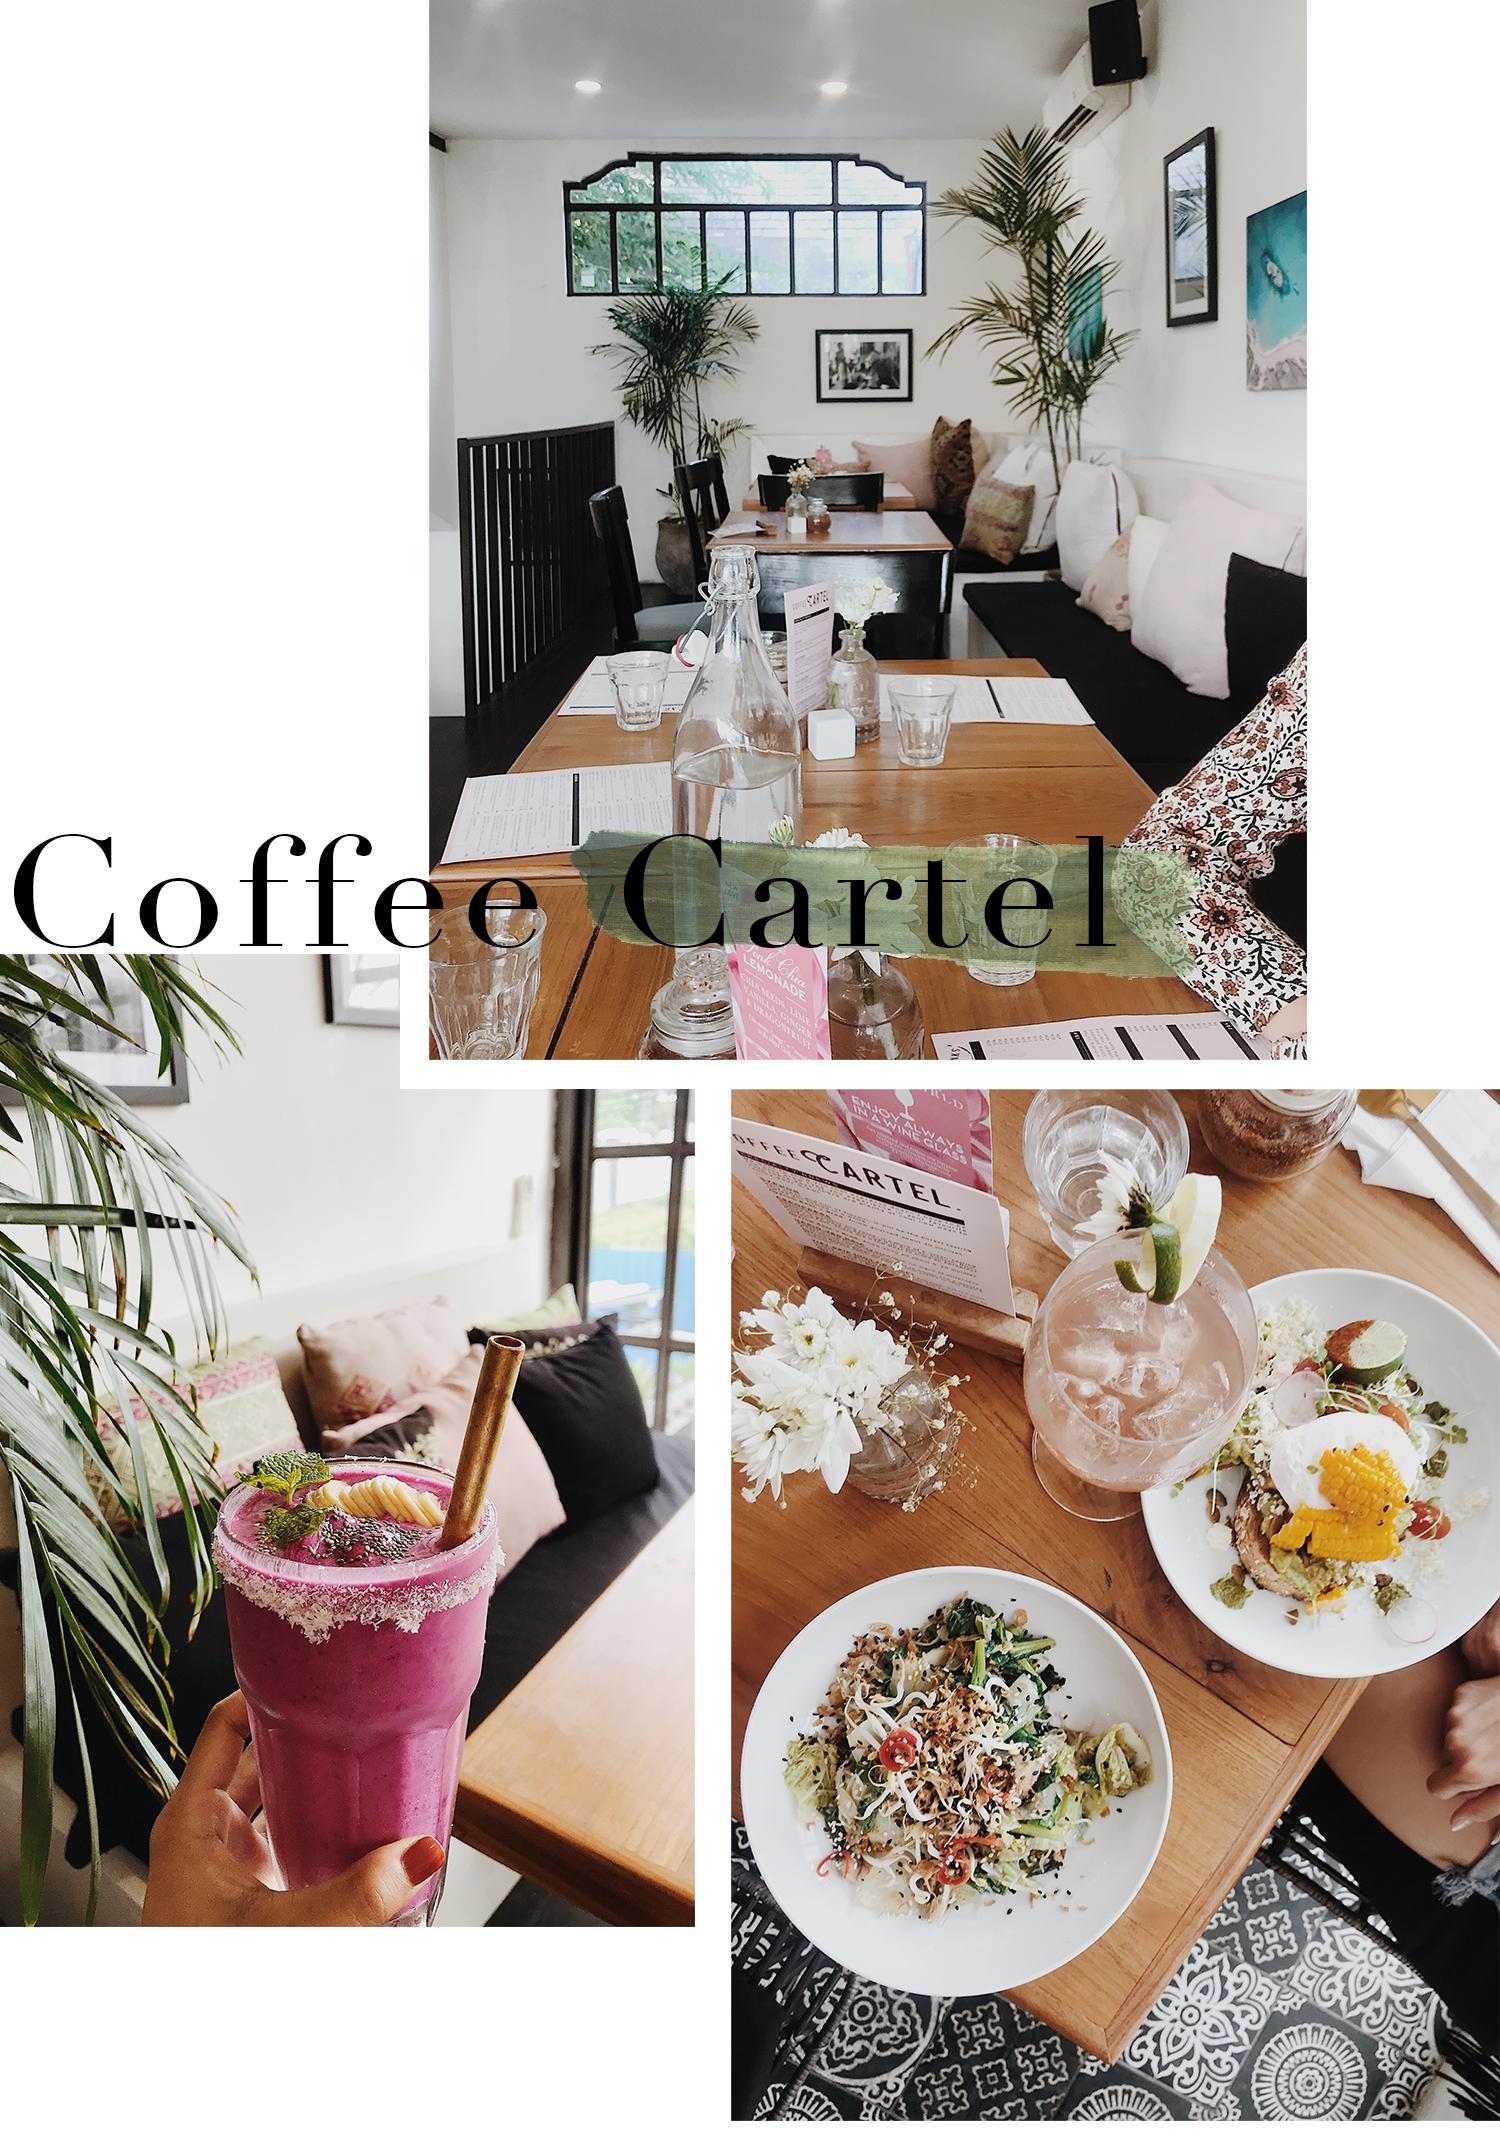 coffeecartel.png